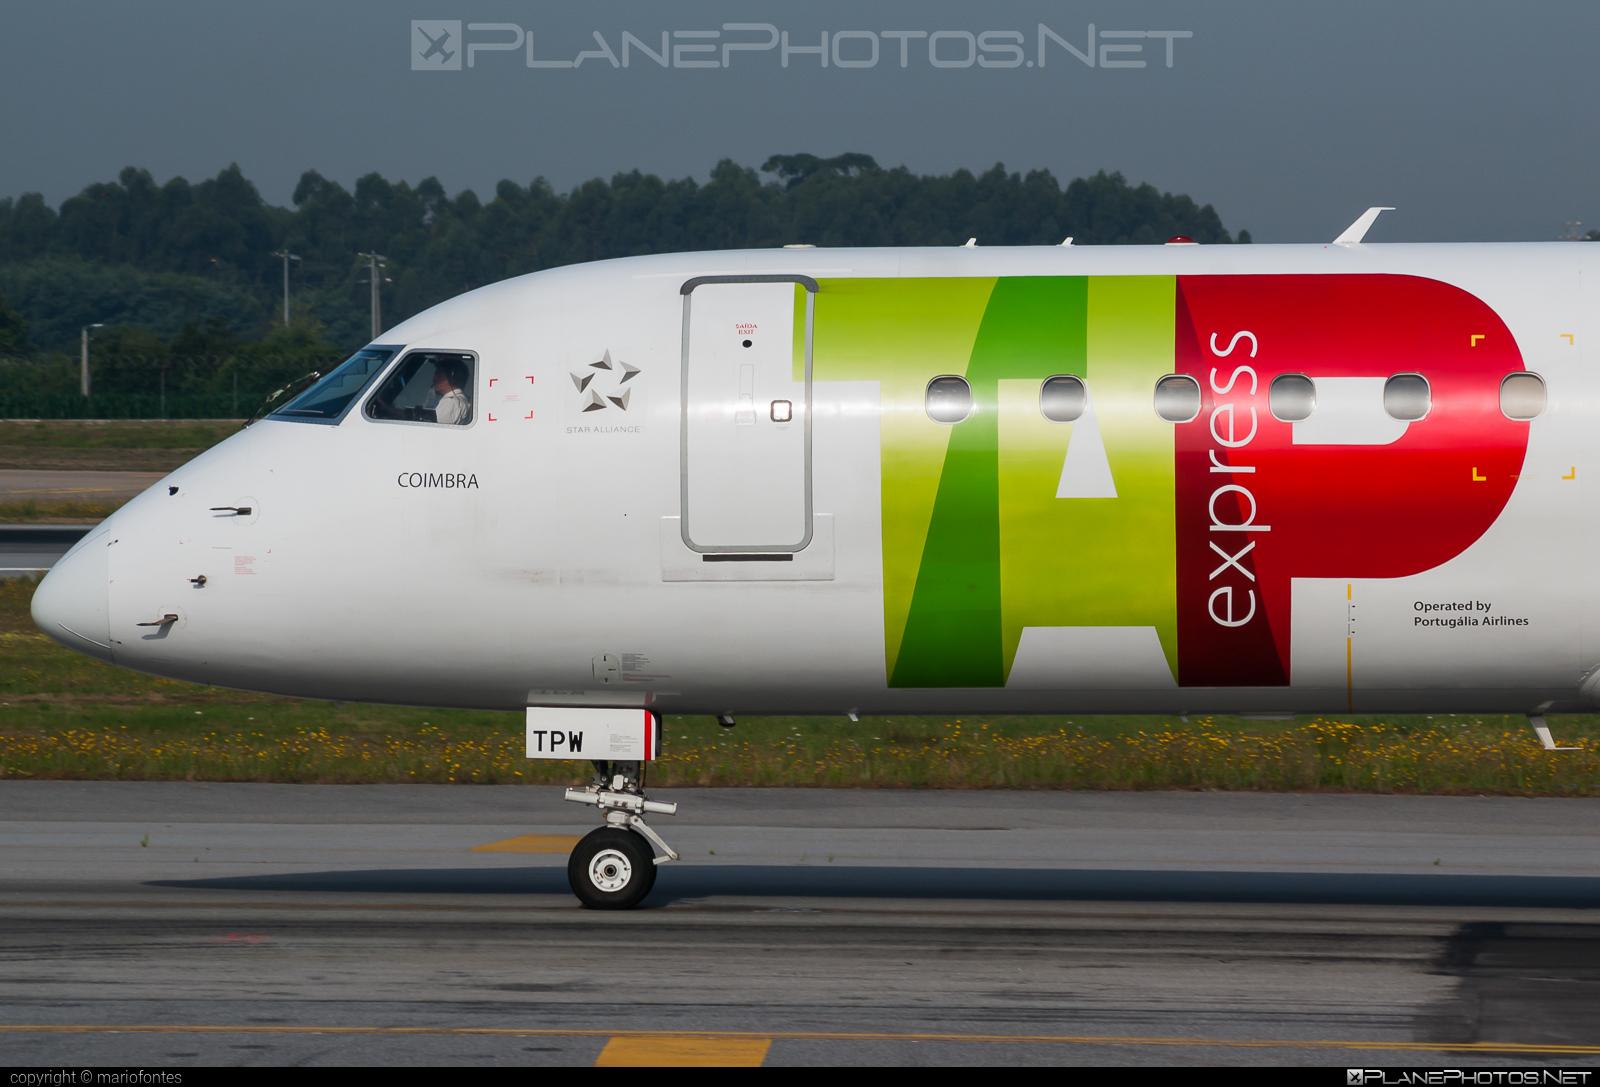 Embraer E190LR (ERJ-190-100LR) - CS-TPW operated by TAP Express #e190 #e190100 #e190100lr #e190lr #embraer #embraer190 #embraer190100lr #embraer190lr